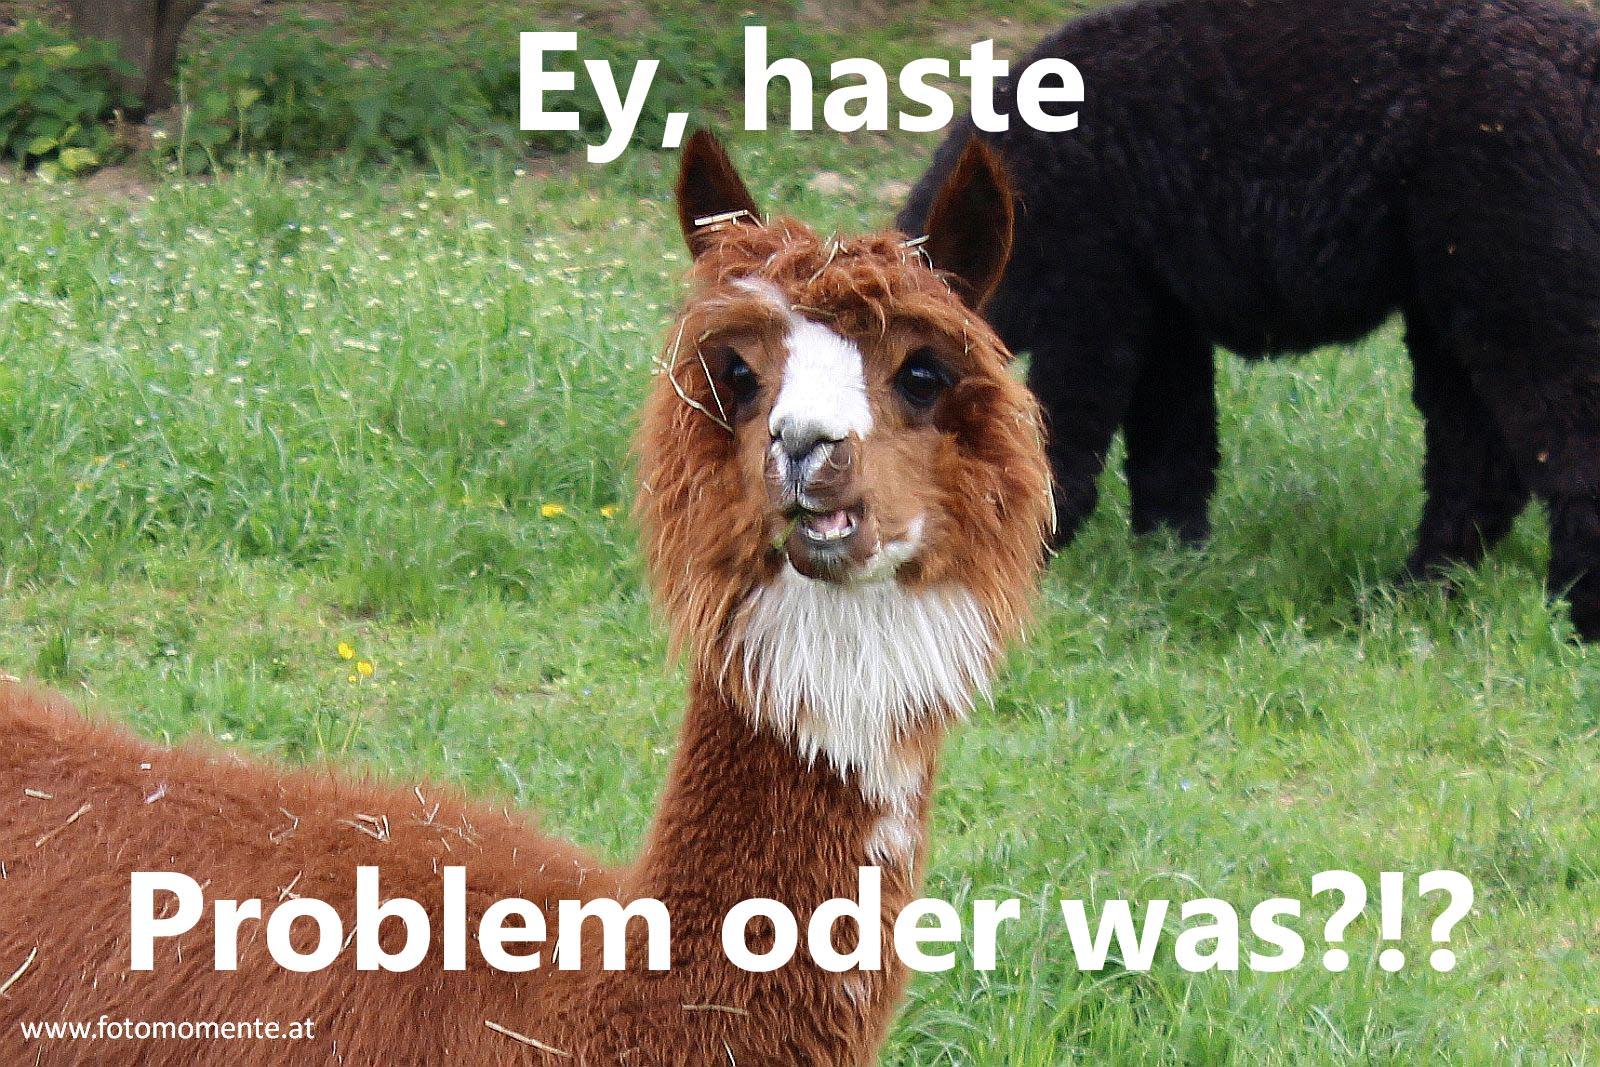 braunes alpaka jungtier problem oder was2 - Braunes Alpaka - Ey, haste Problem oder was?